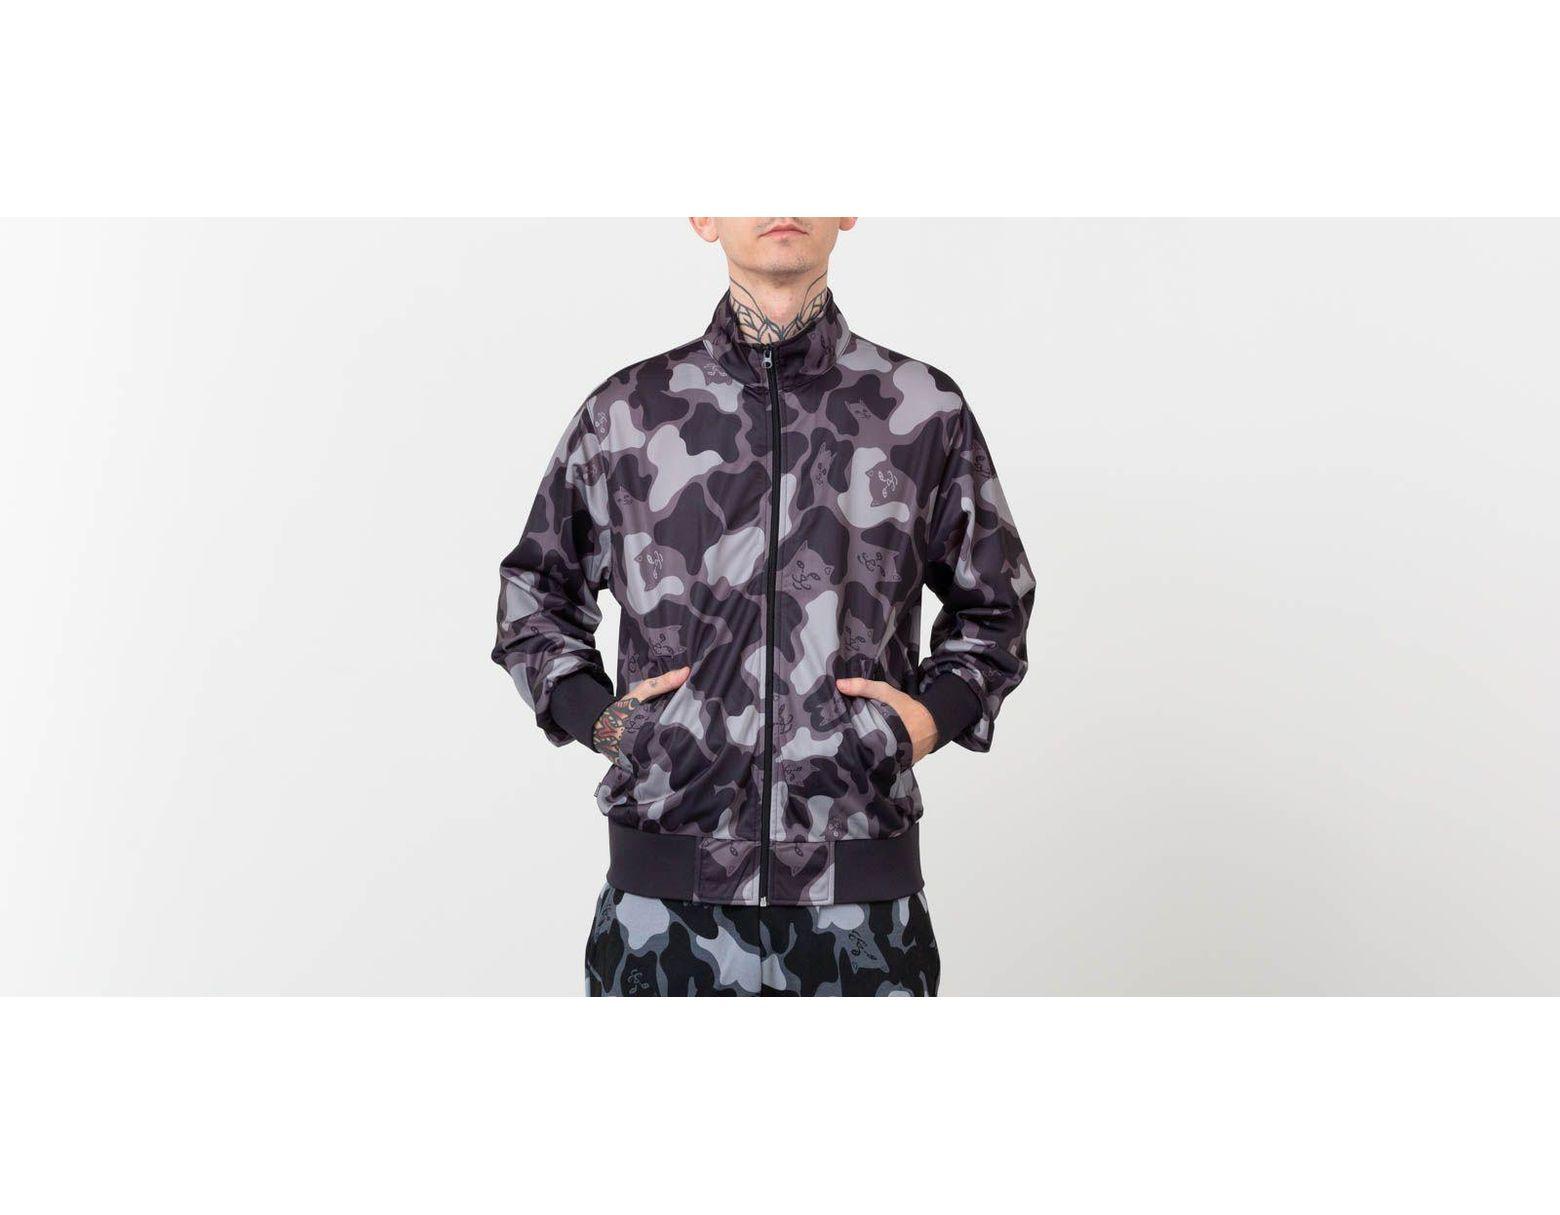 37f3824e12f25 RIPNDIP Nerm Camo Track Jacket Blackout Camo for Men - Save 40% - Lyst